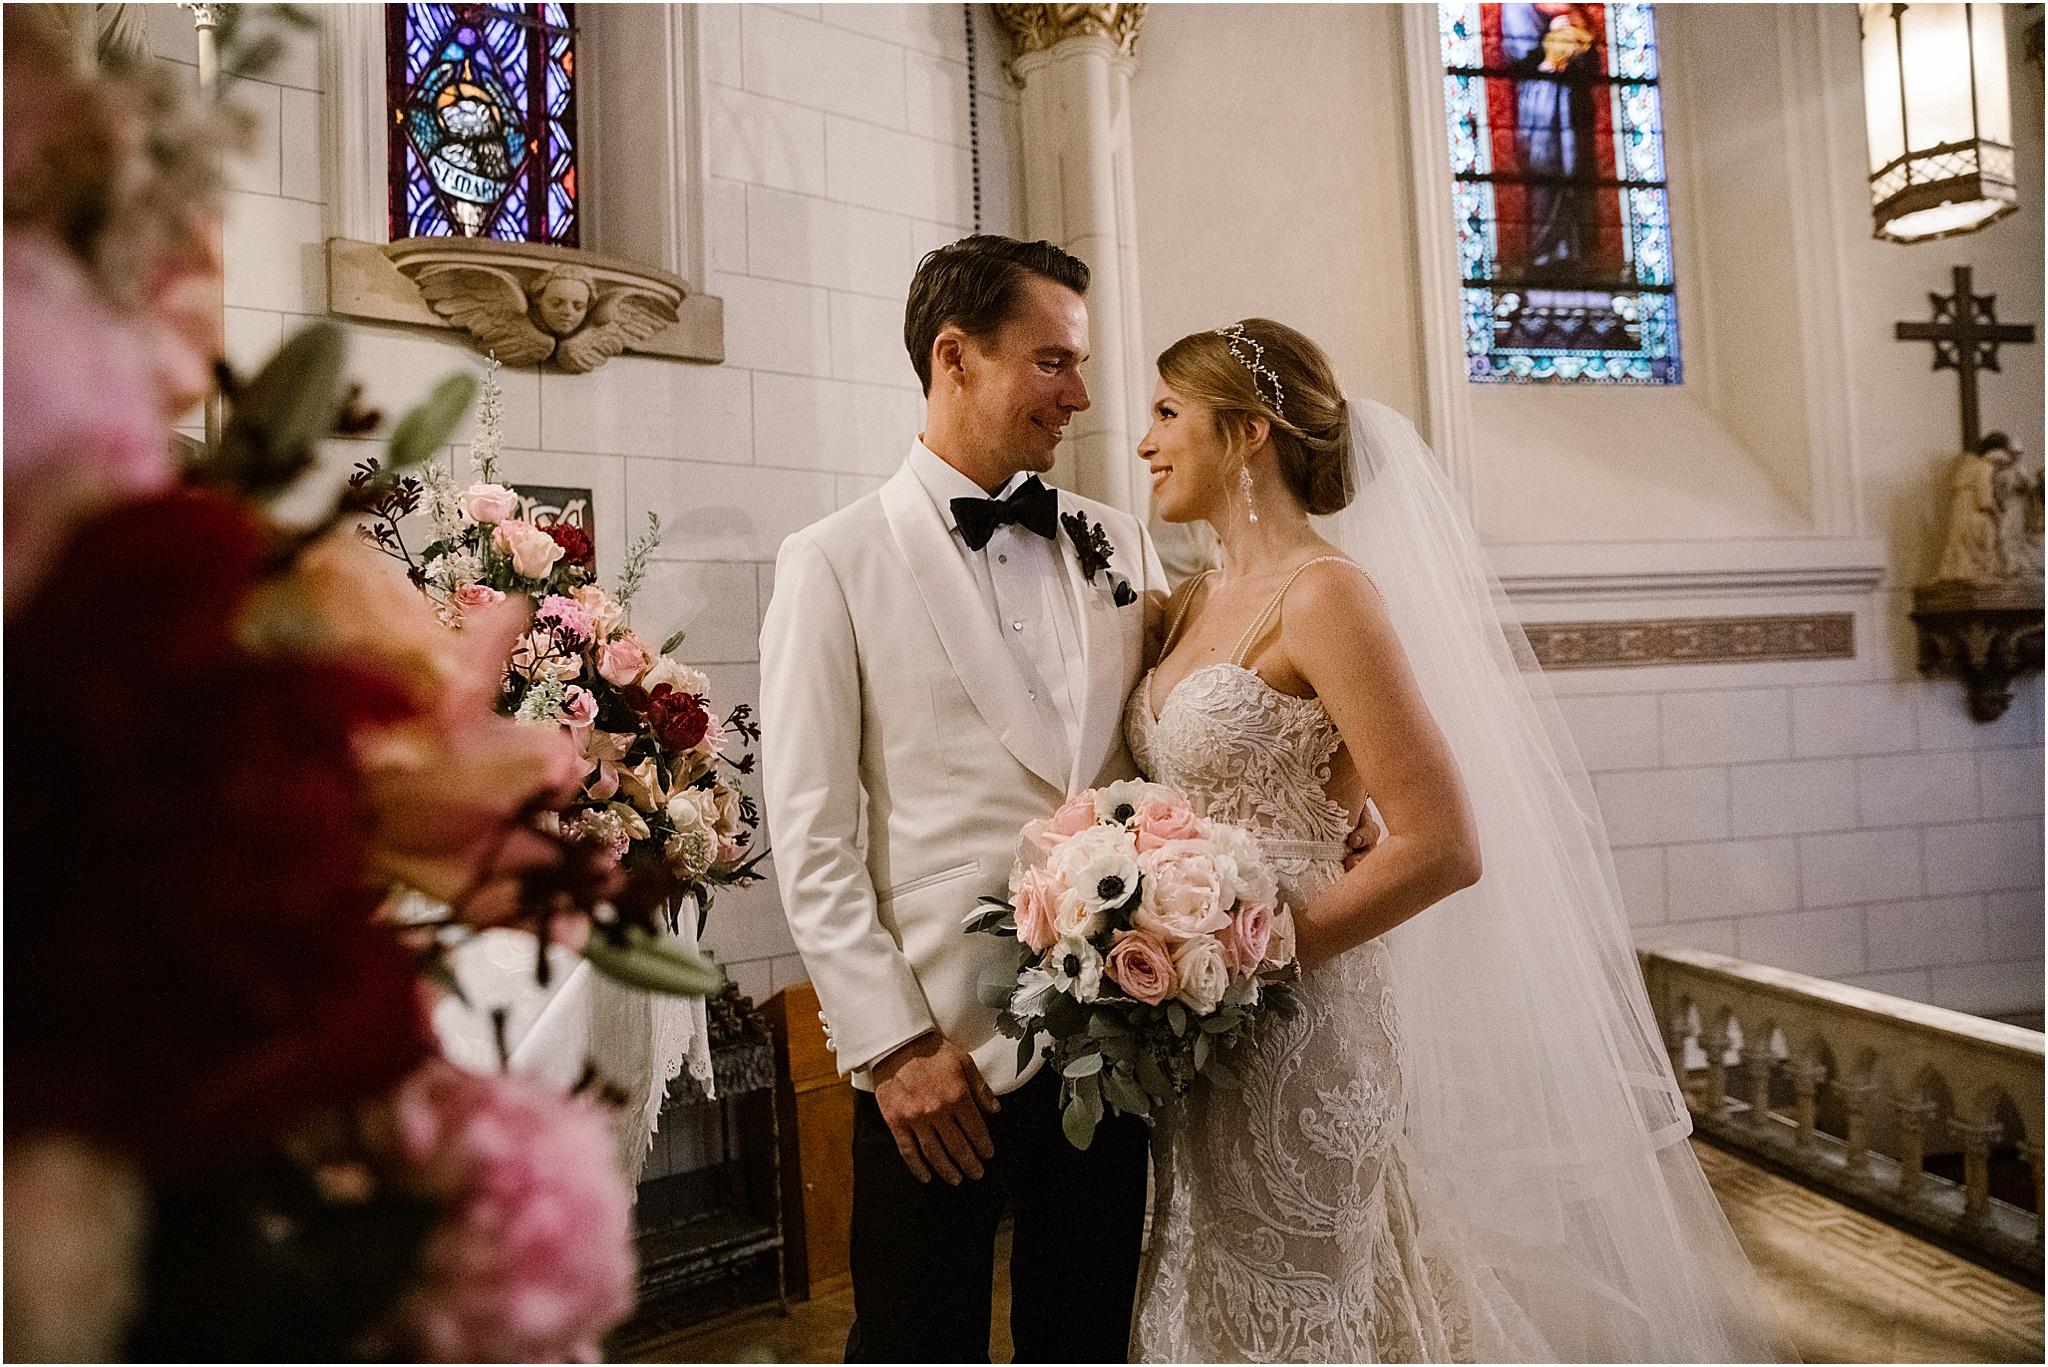 BLUE ROSE PHOTOGRAPHY SANTA FE WEDDING_26